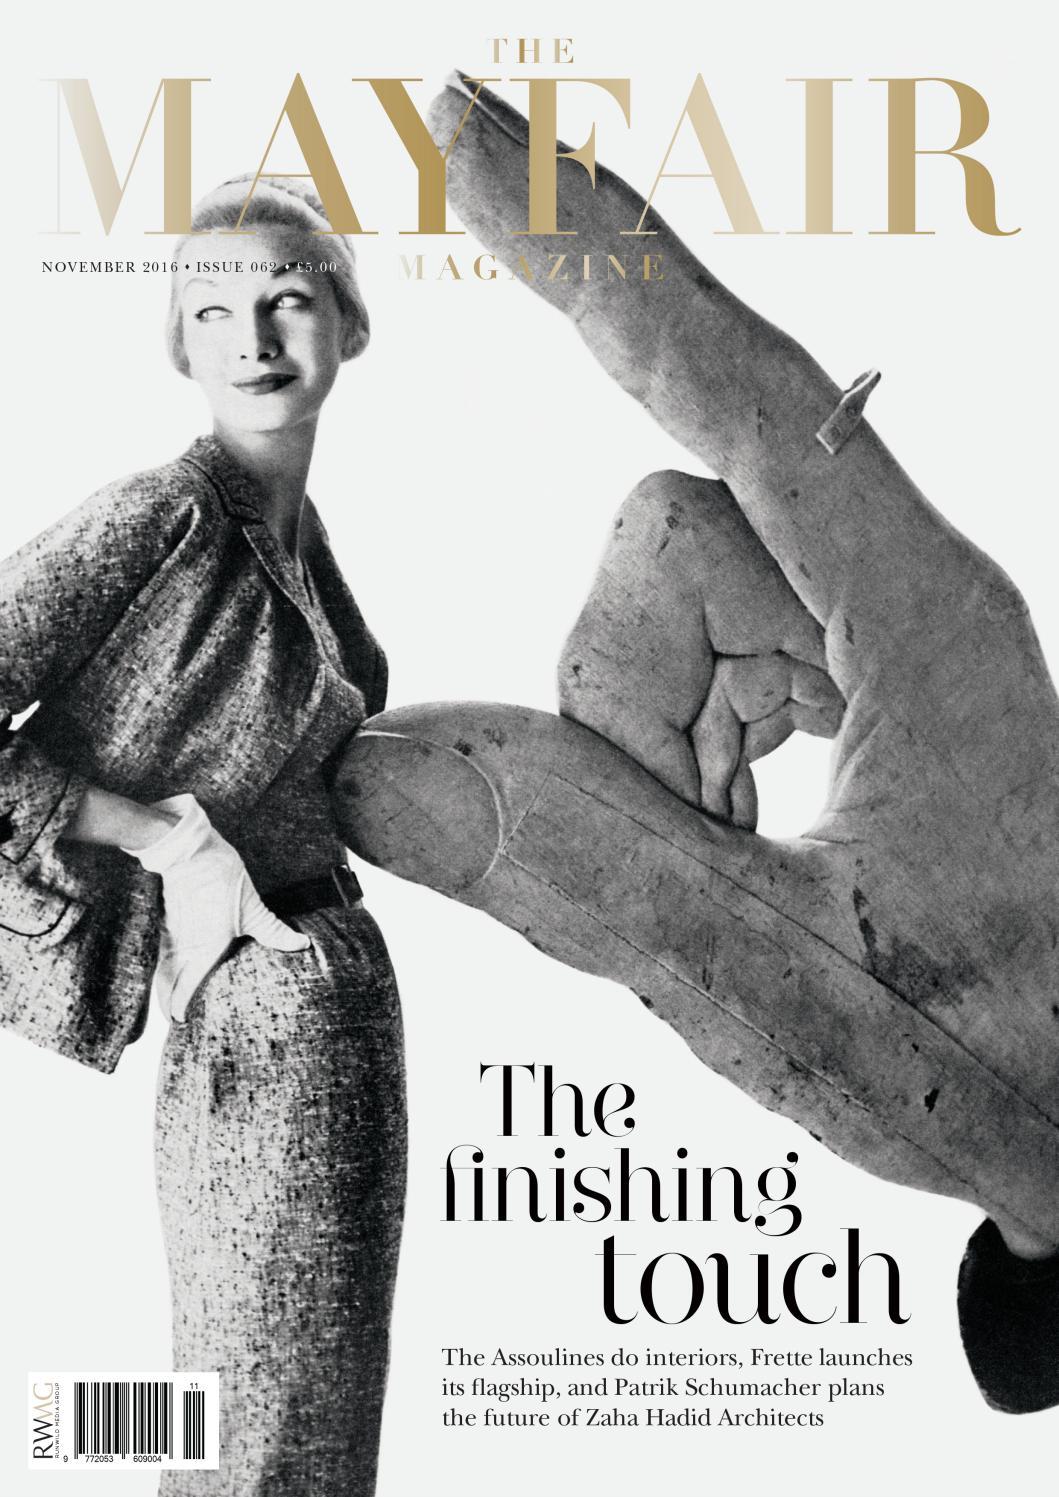 32c65d382fb4 The Mayfair Magazine November 2016 by Runwild Media Group - issuu